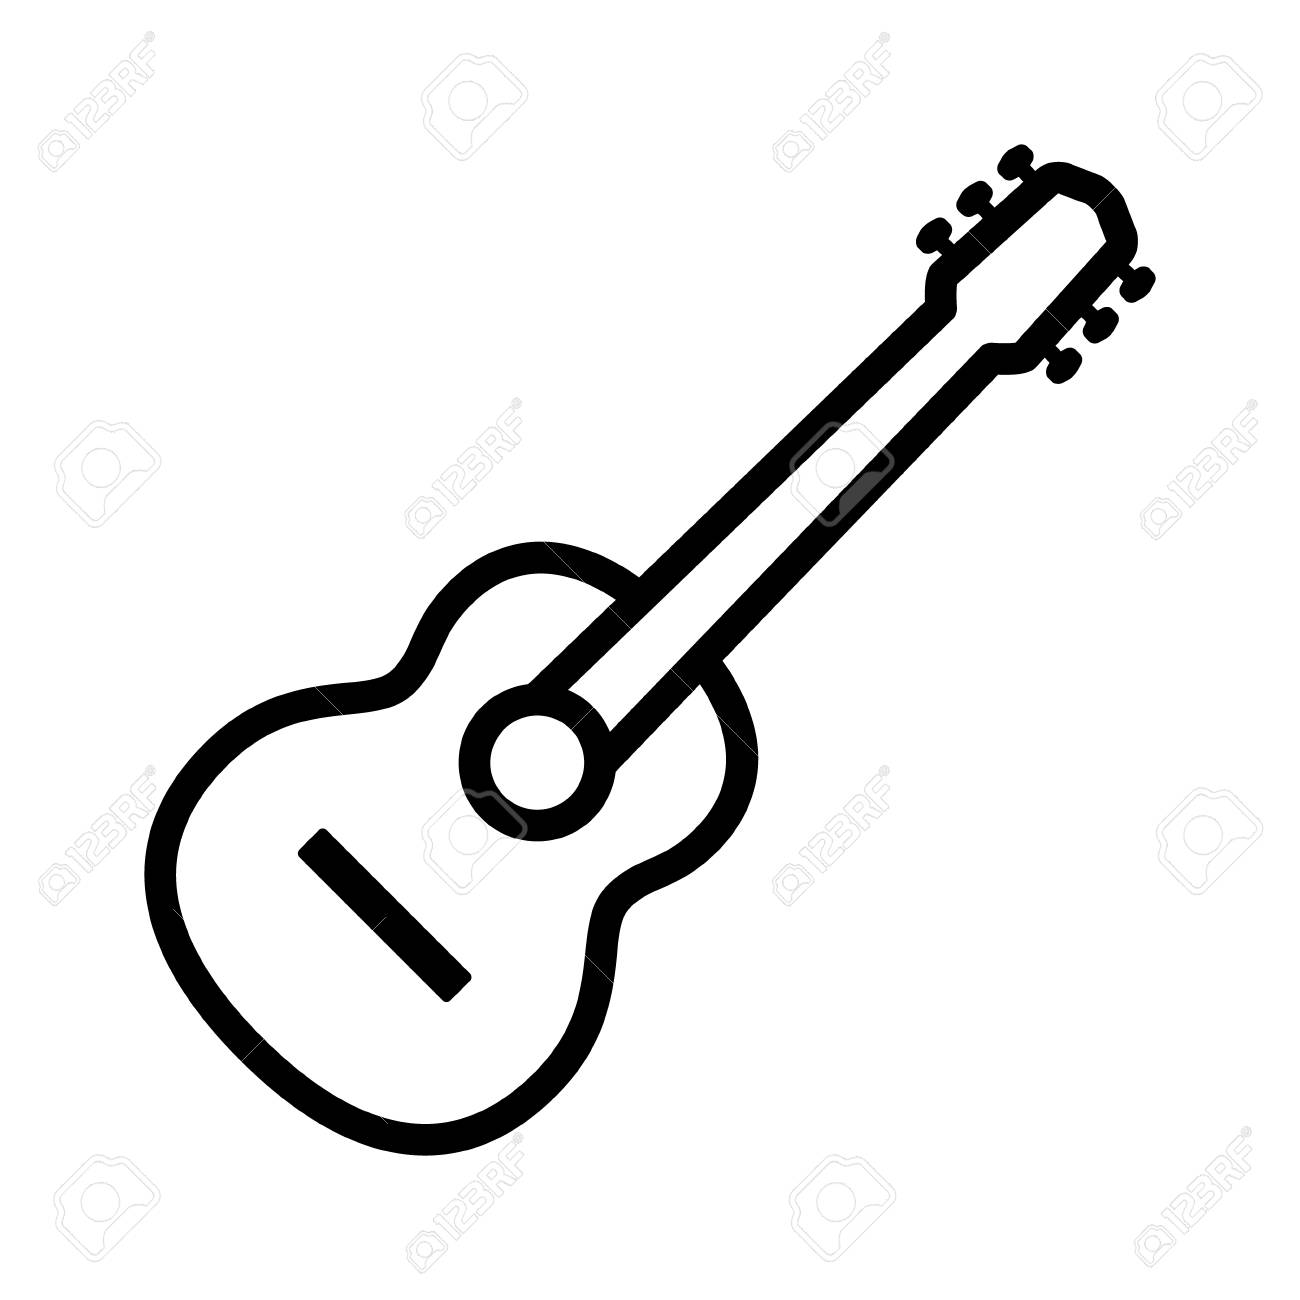 Guitar Line Art